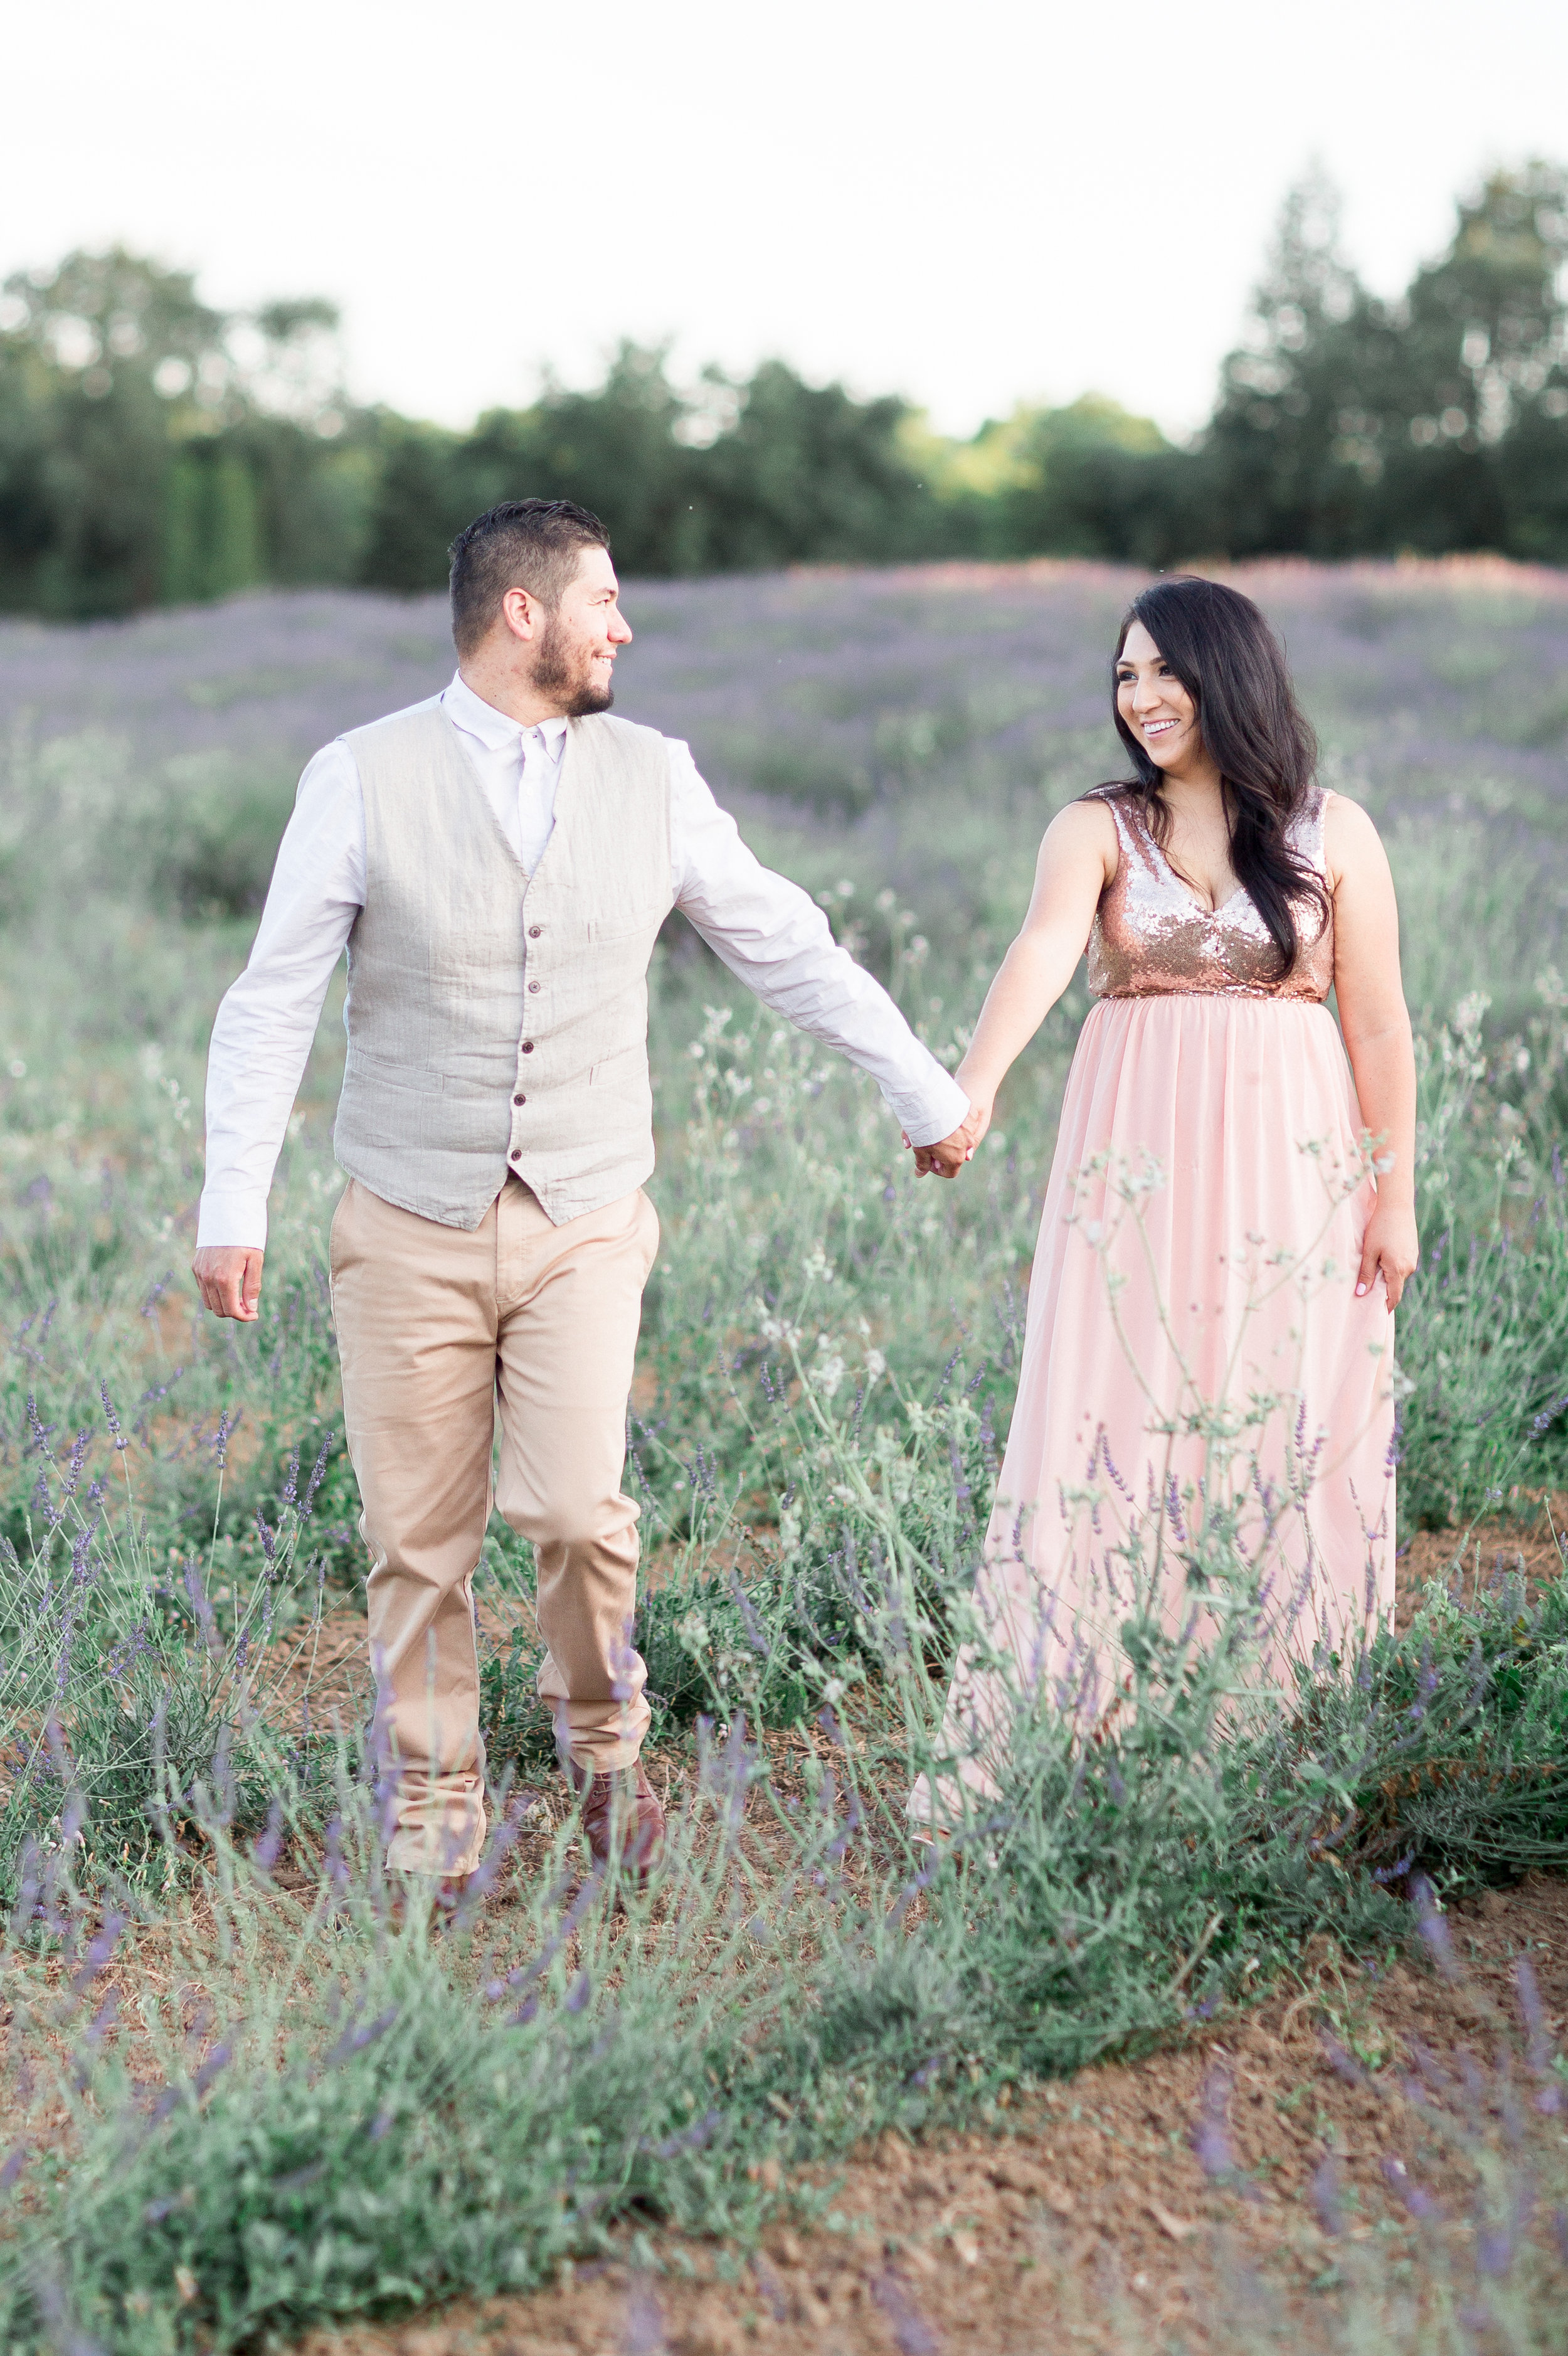 Bayliss-Ranch-Lavender-Farm-California-engagement-photos (98 of 131).jpg